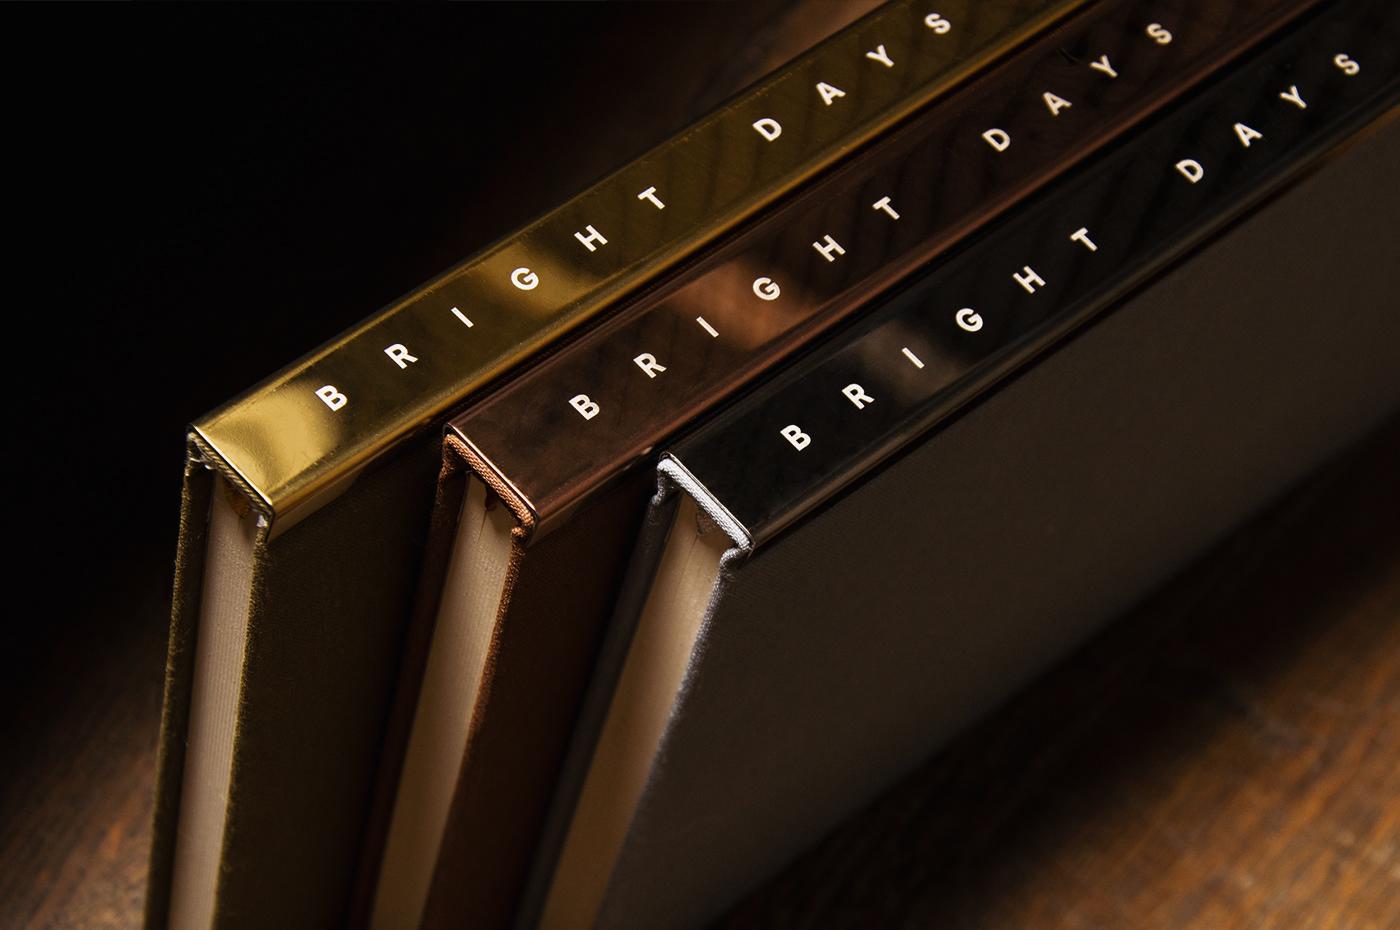 binding,Calender,Craftmanship,design,foil,metal,notebook,present,print,sketchbook